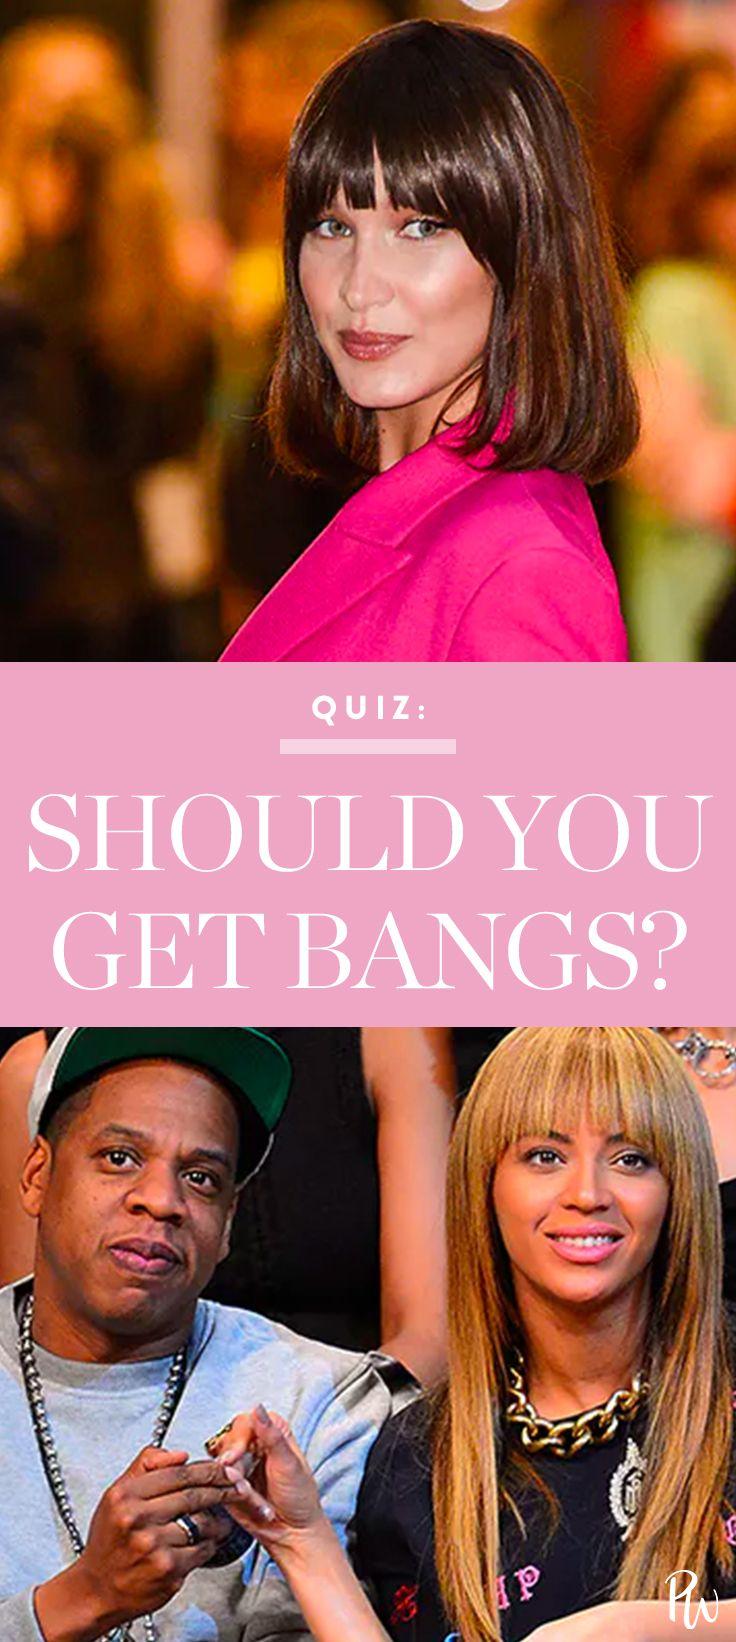 should you get bangs? | hair inspiration | pinterest | bang